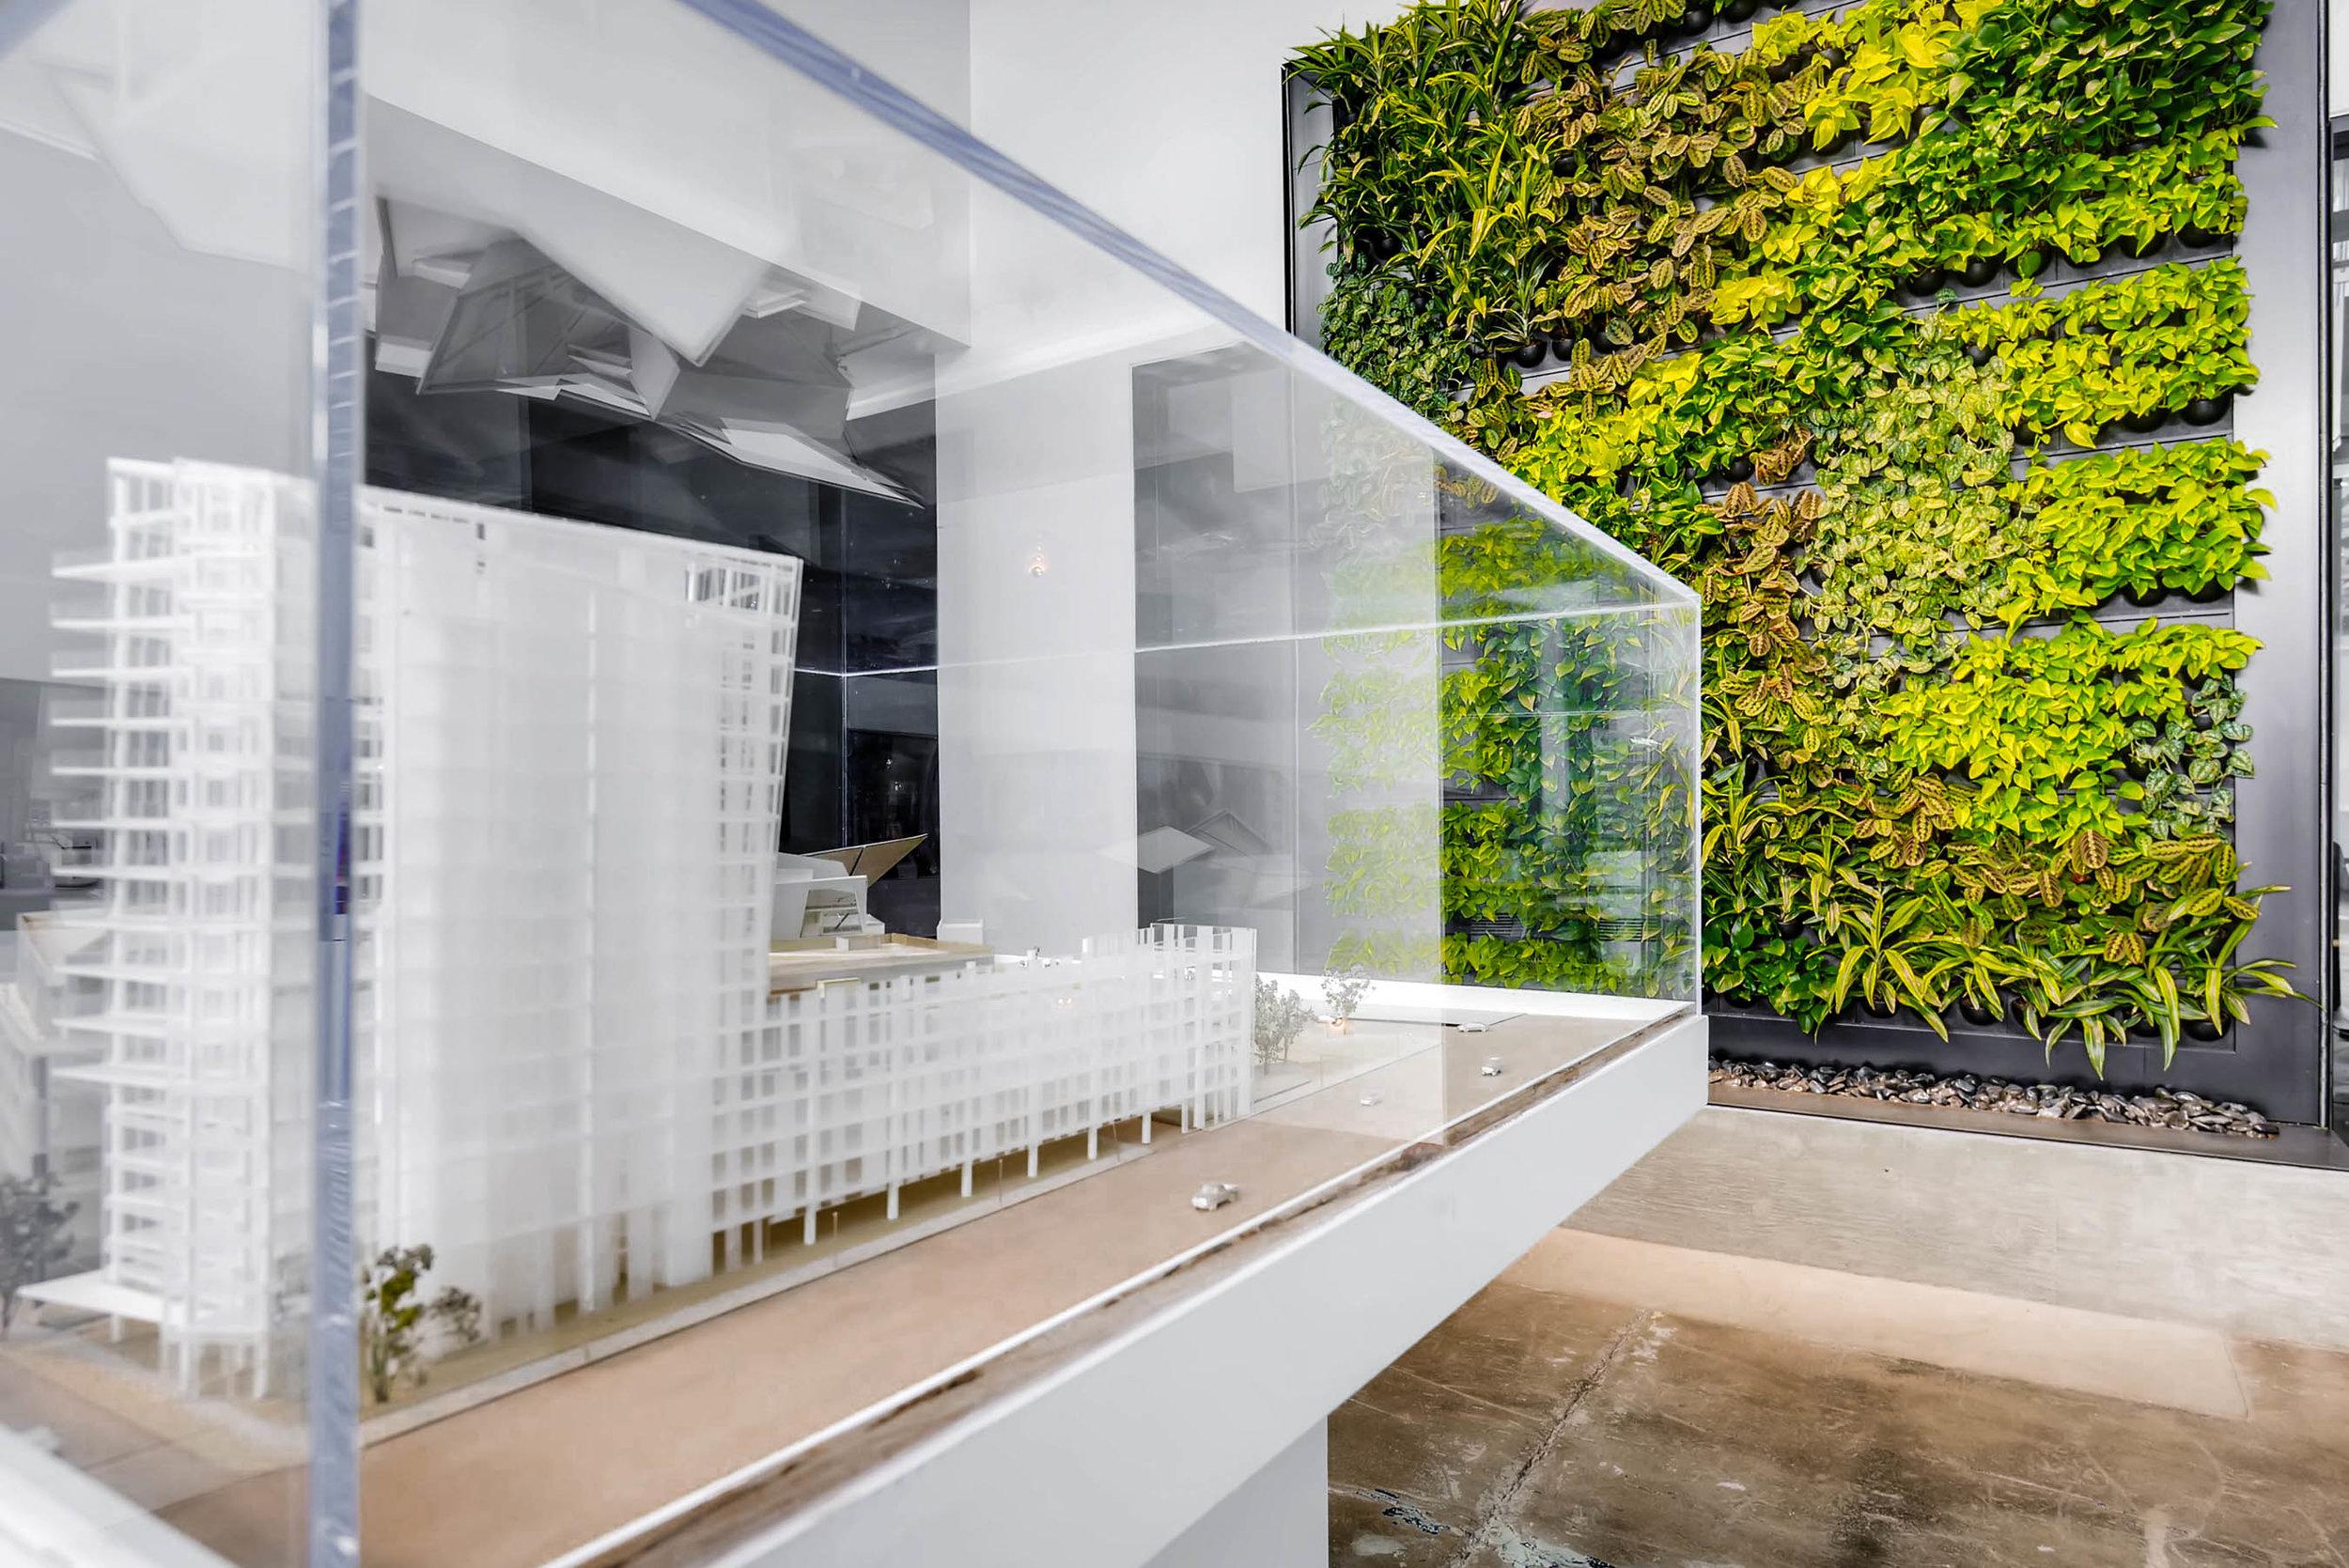 Interior plant wall - Architecture Firm in Denver, Colorado